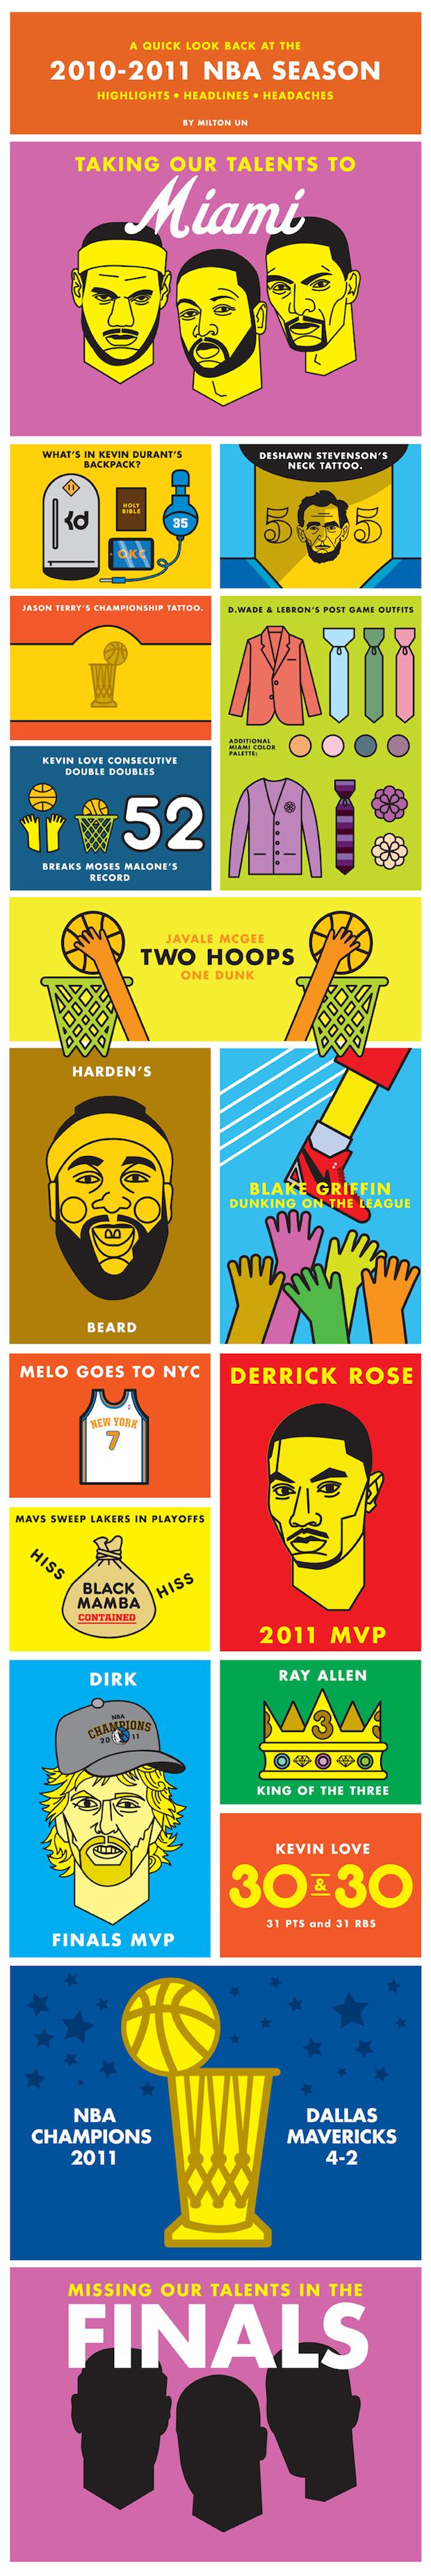 2010-2011 NBA Season Highlights